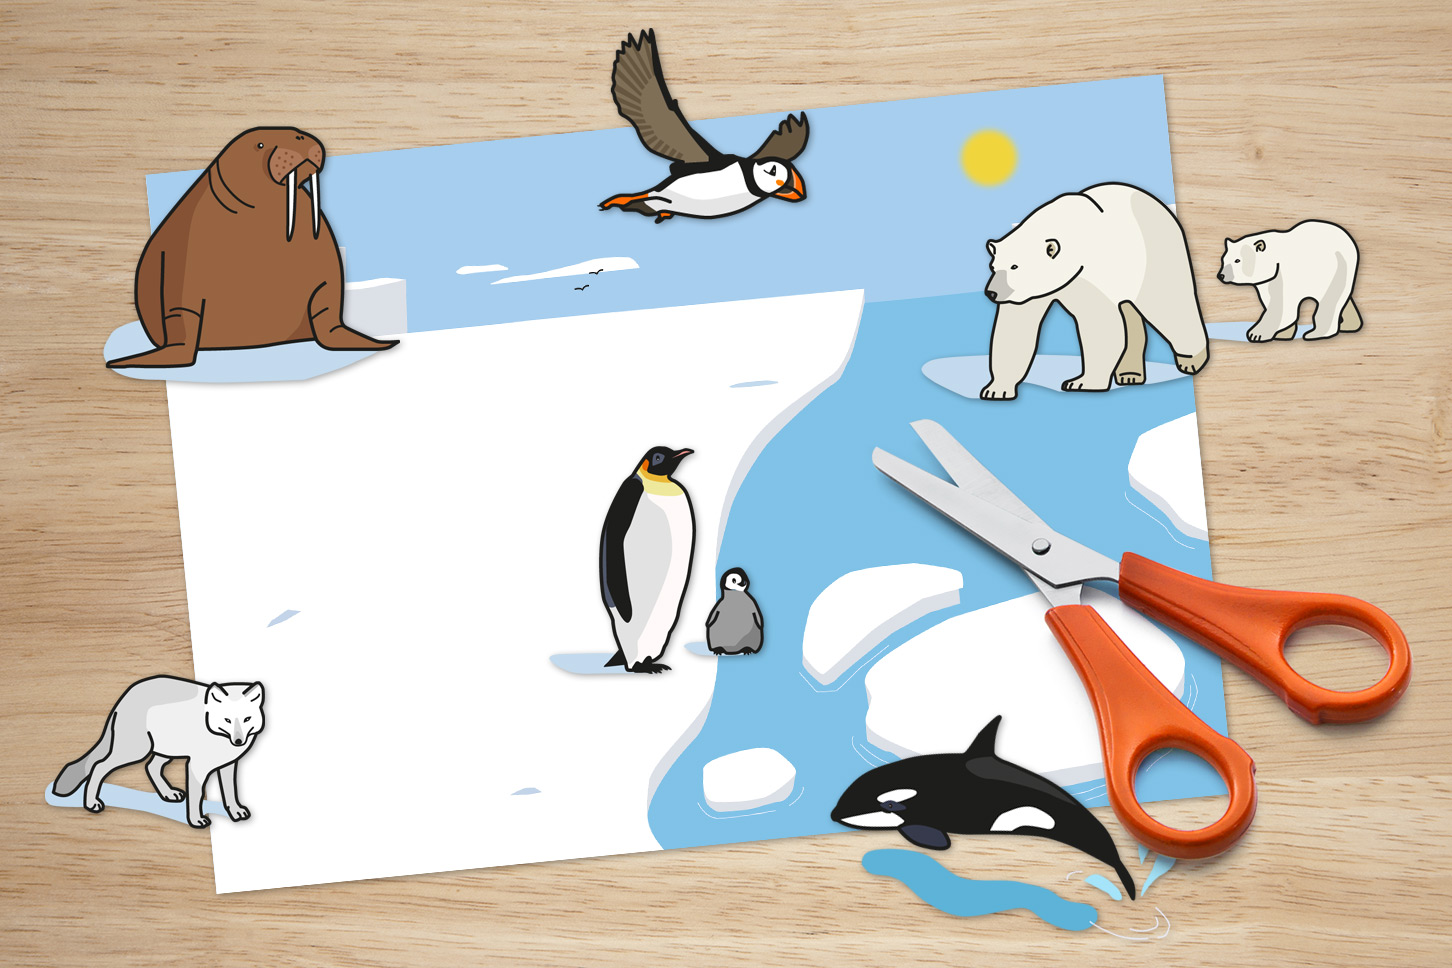 Animales del paisaje ártico